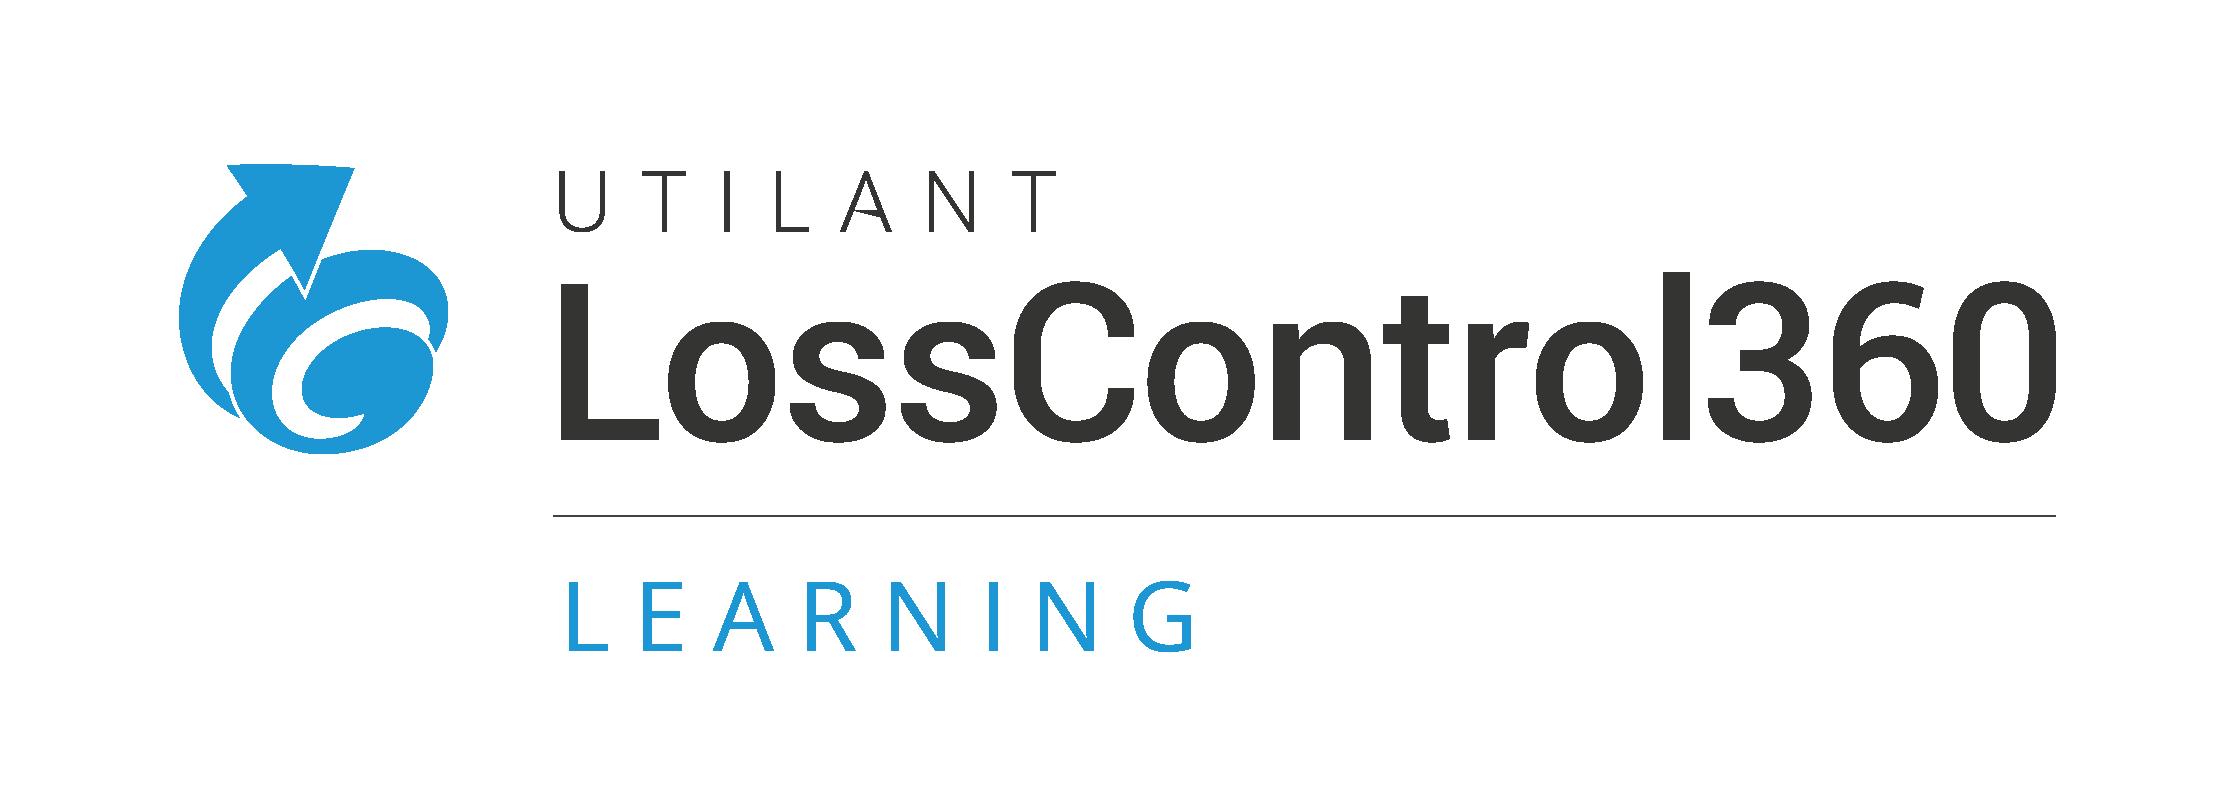 Loss Control 360 Learning Logo